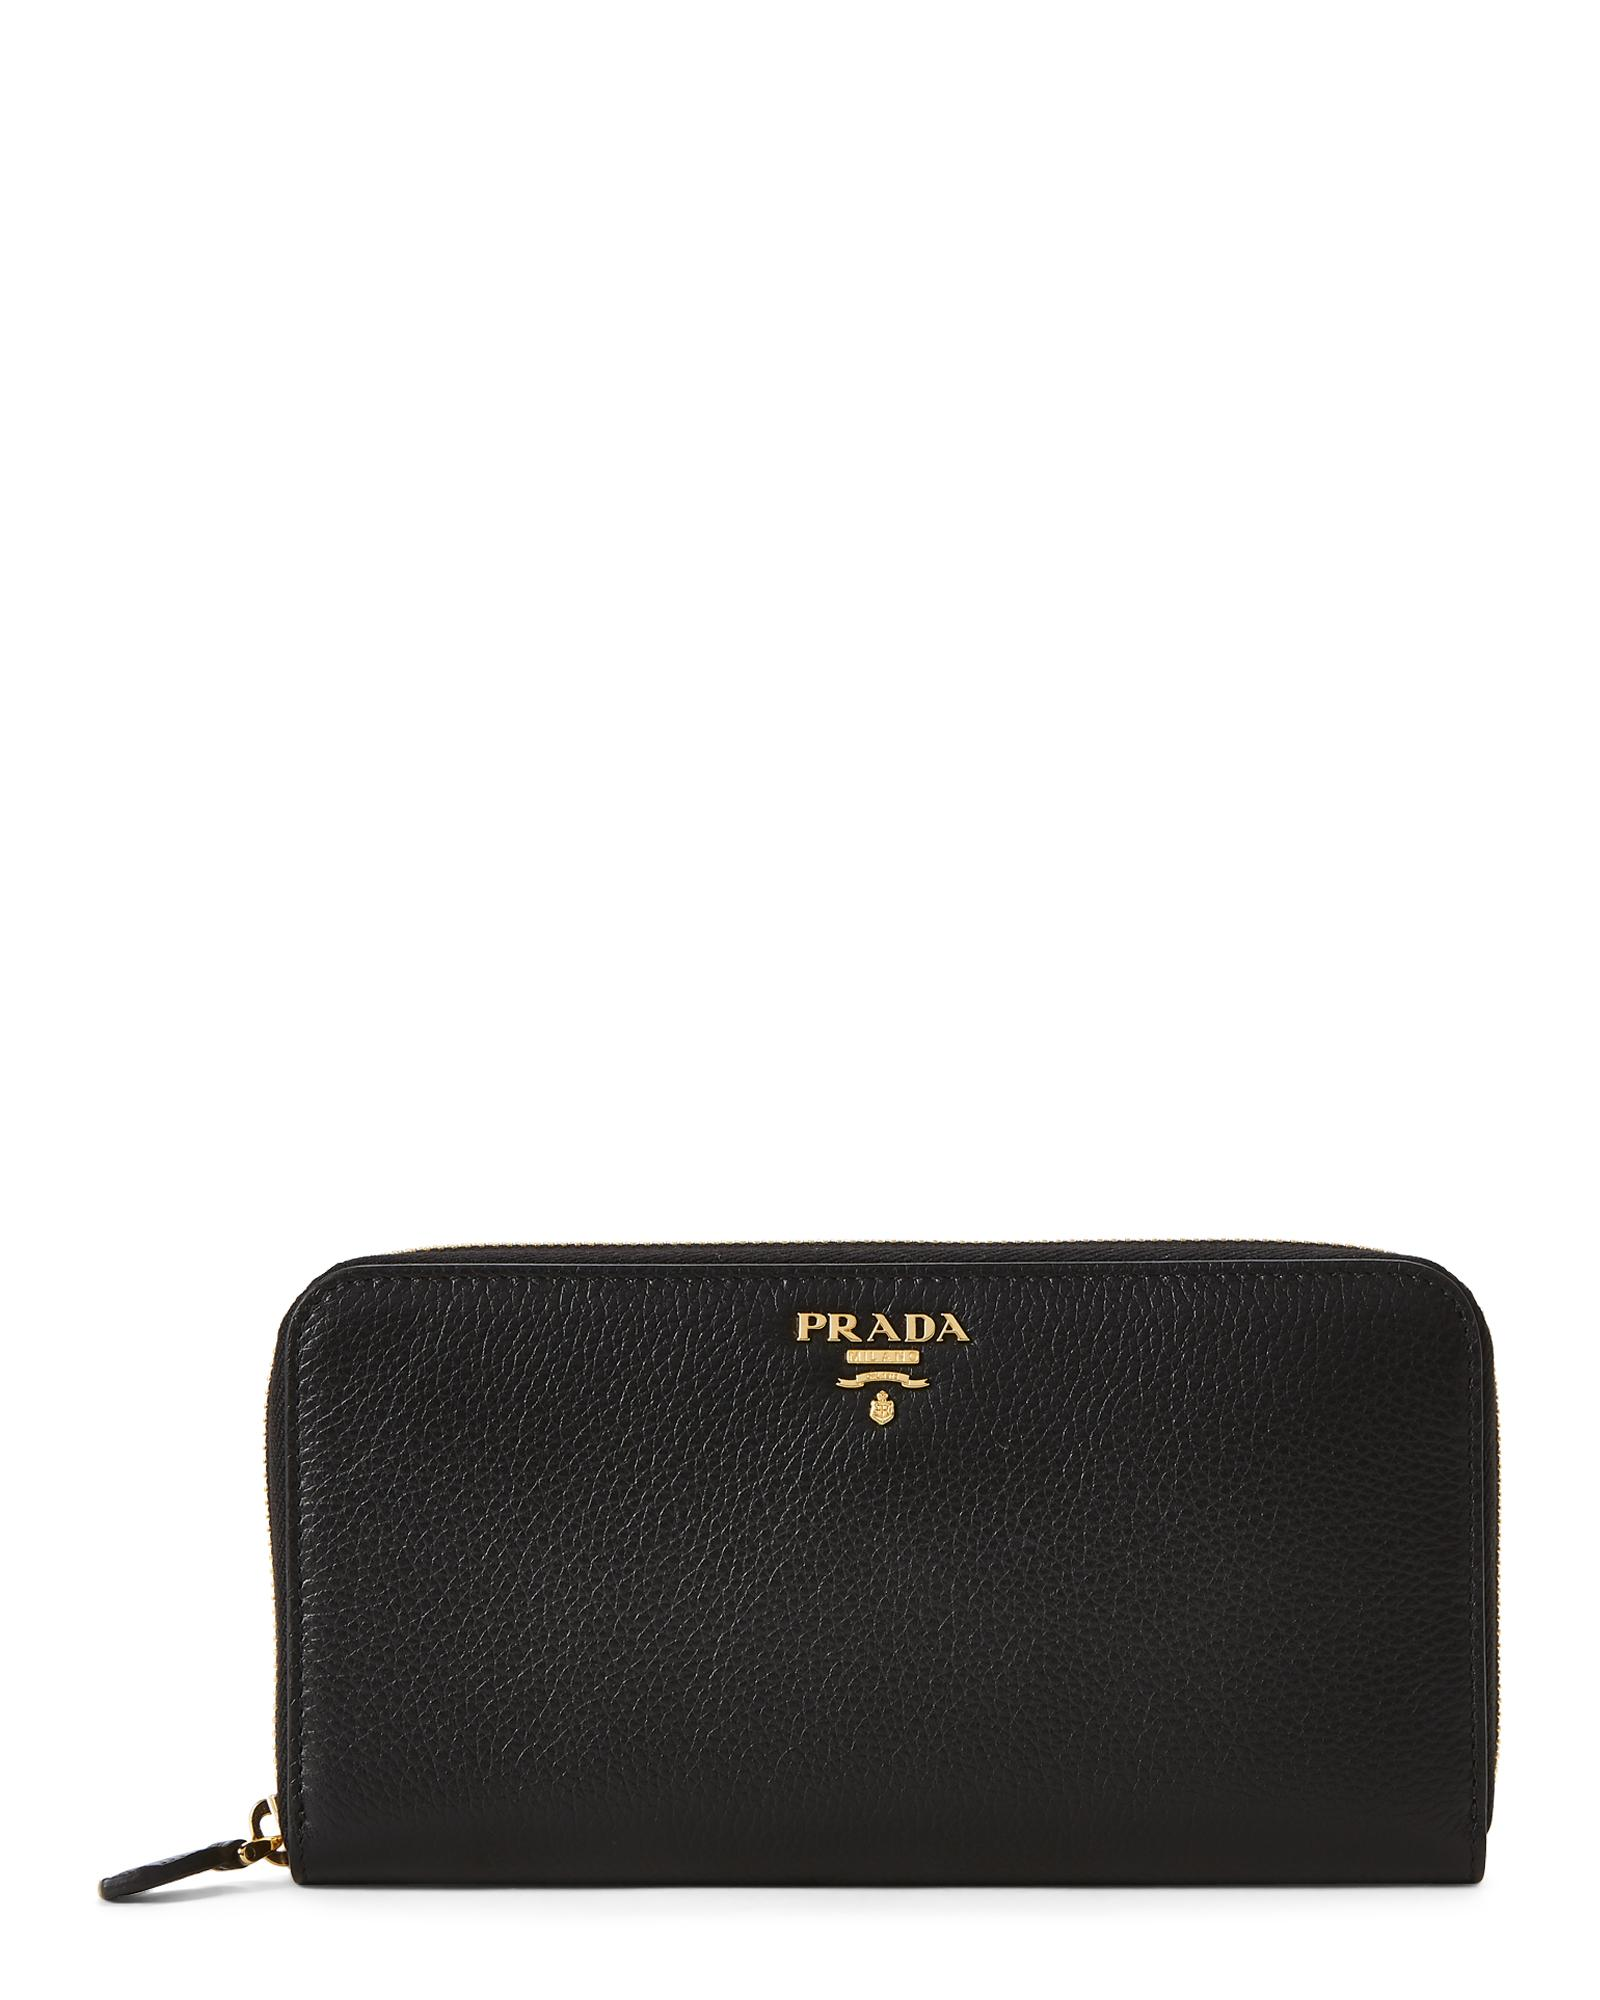 820023565808 Prada Black Leather Zip-around Wallet in Black - Lyst